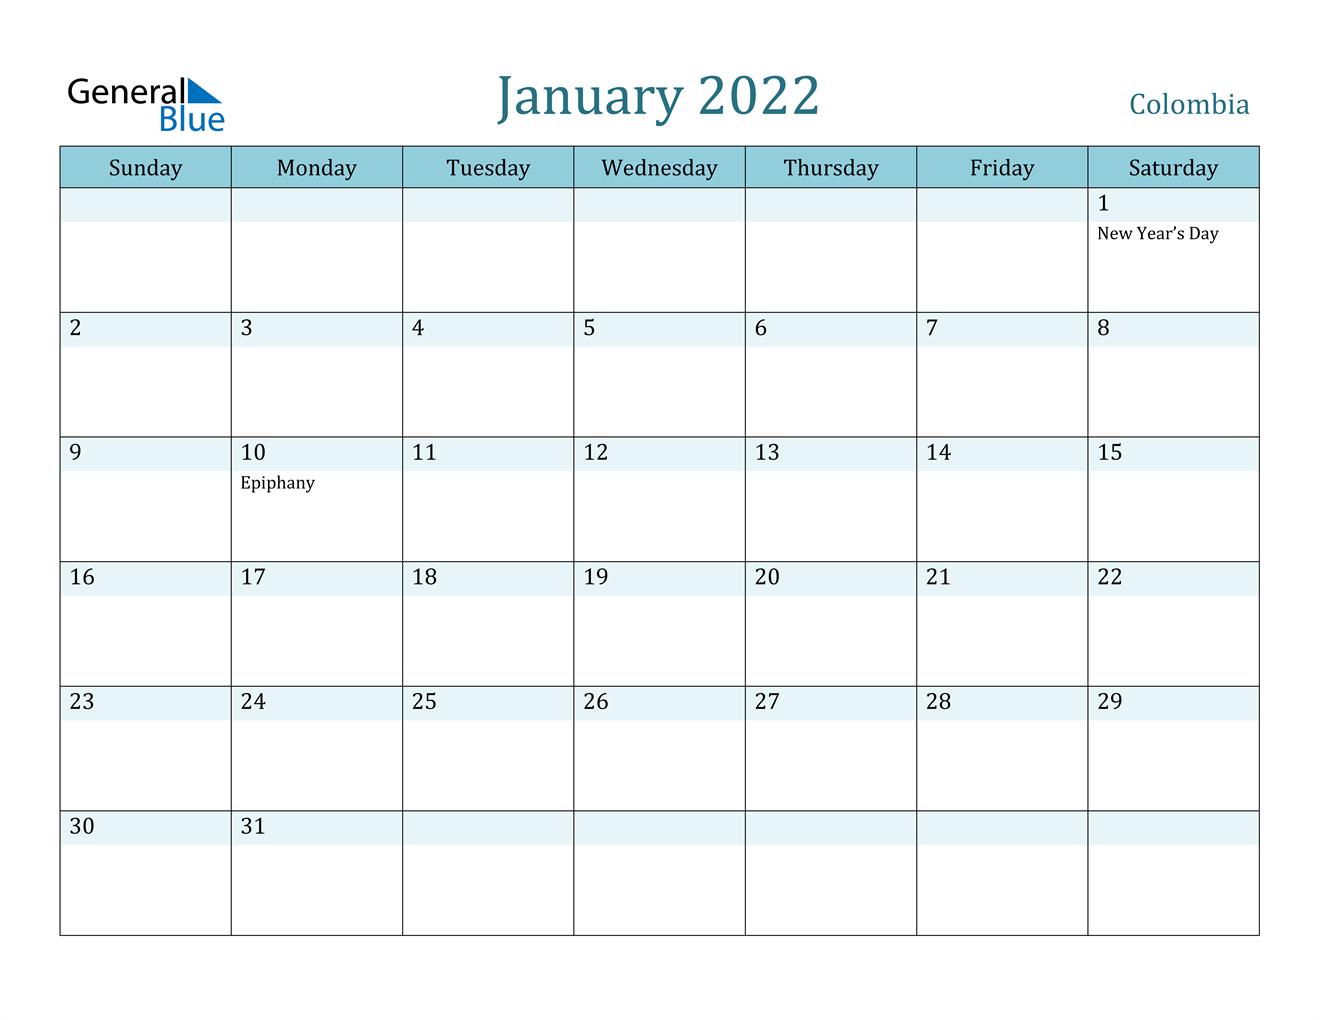 January 2022 Calendar - Colombia